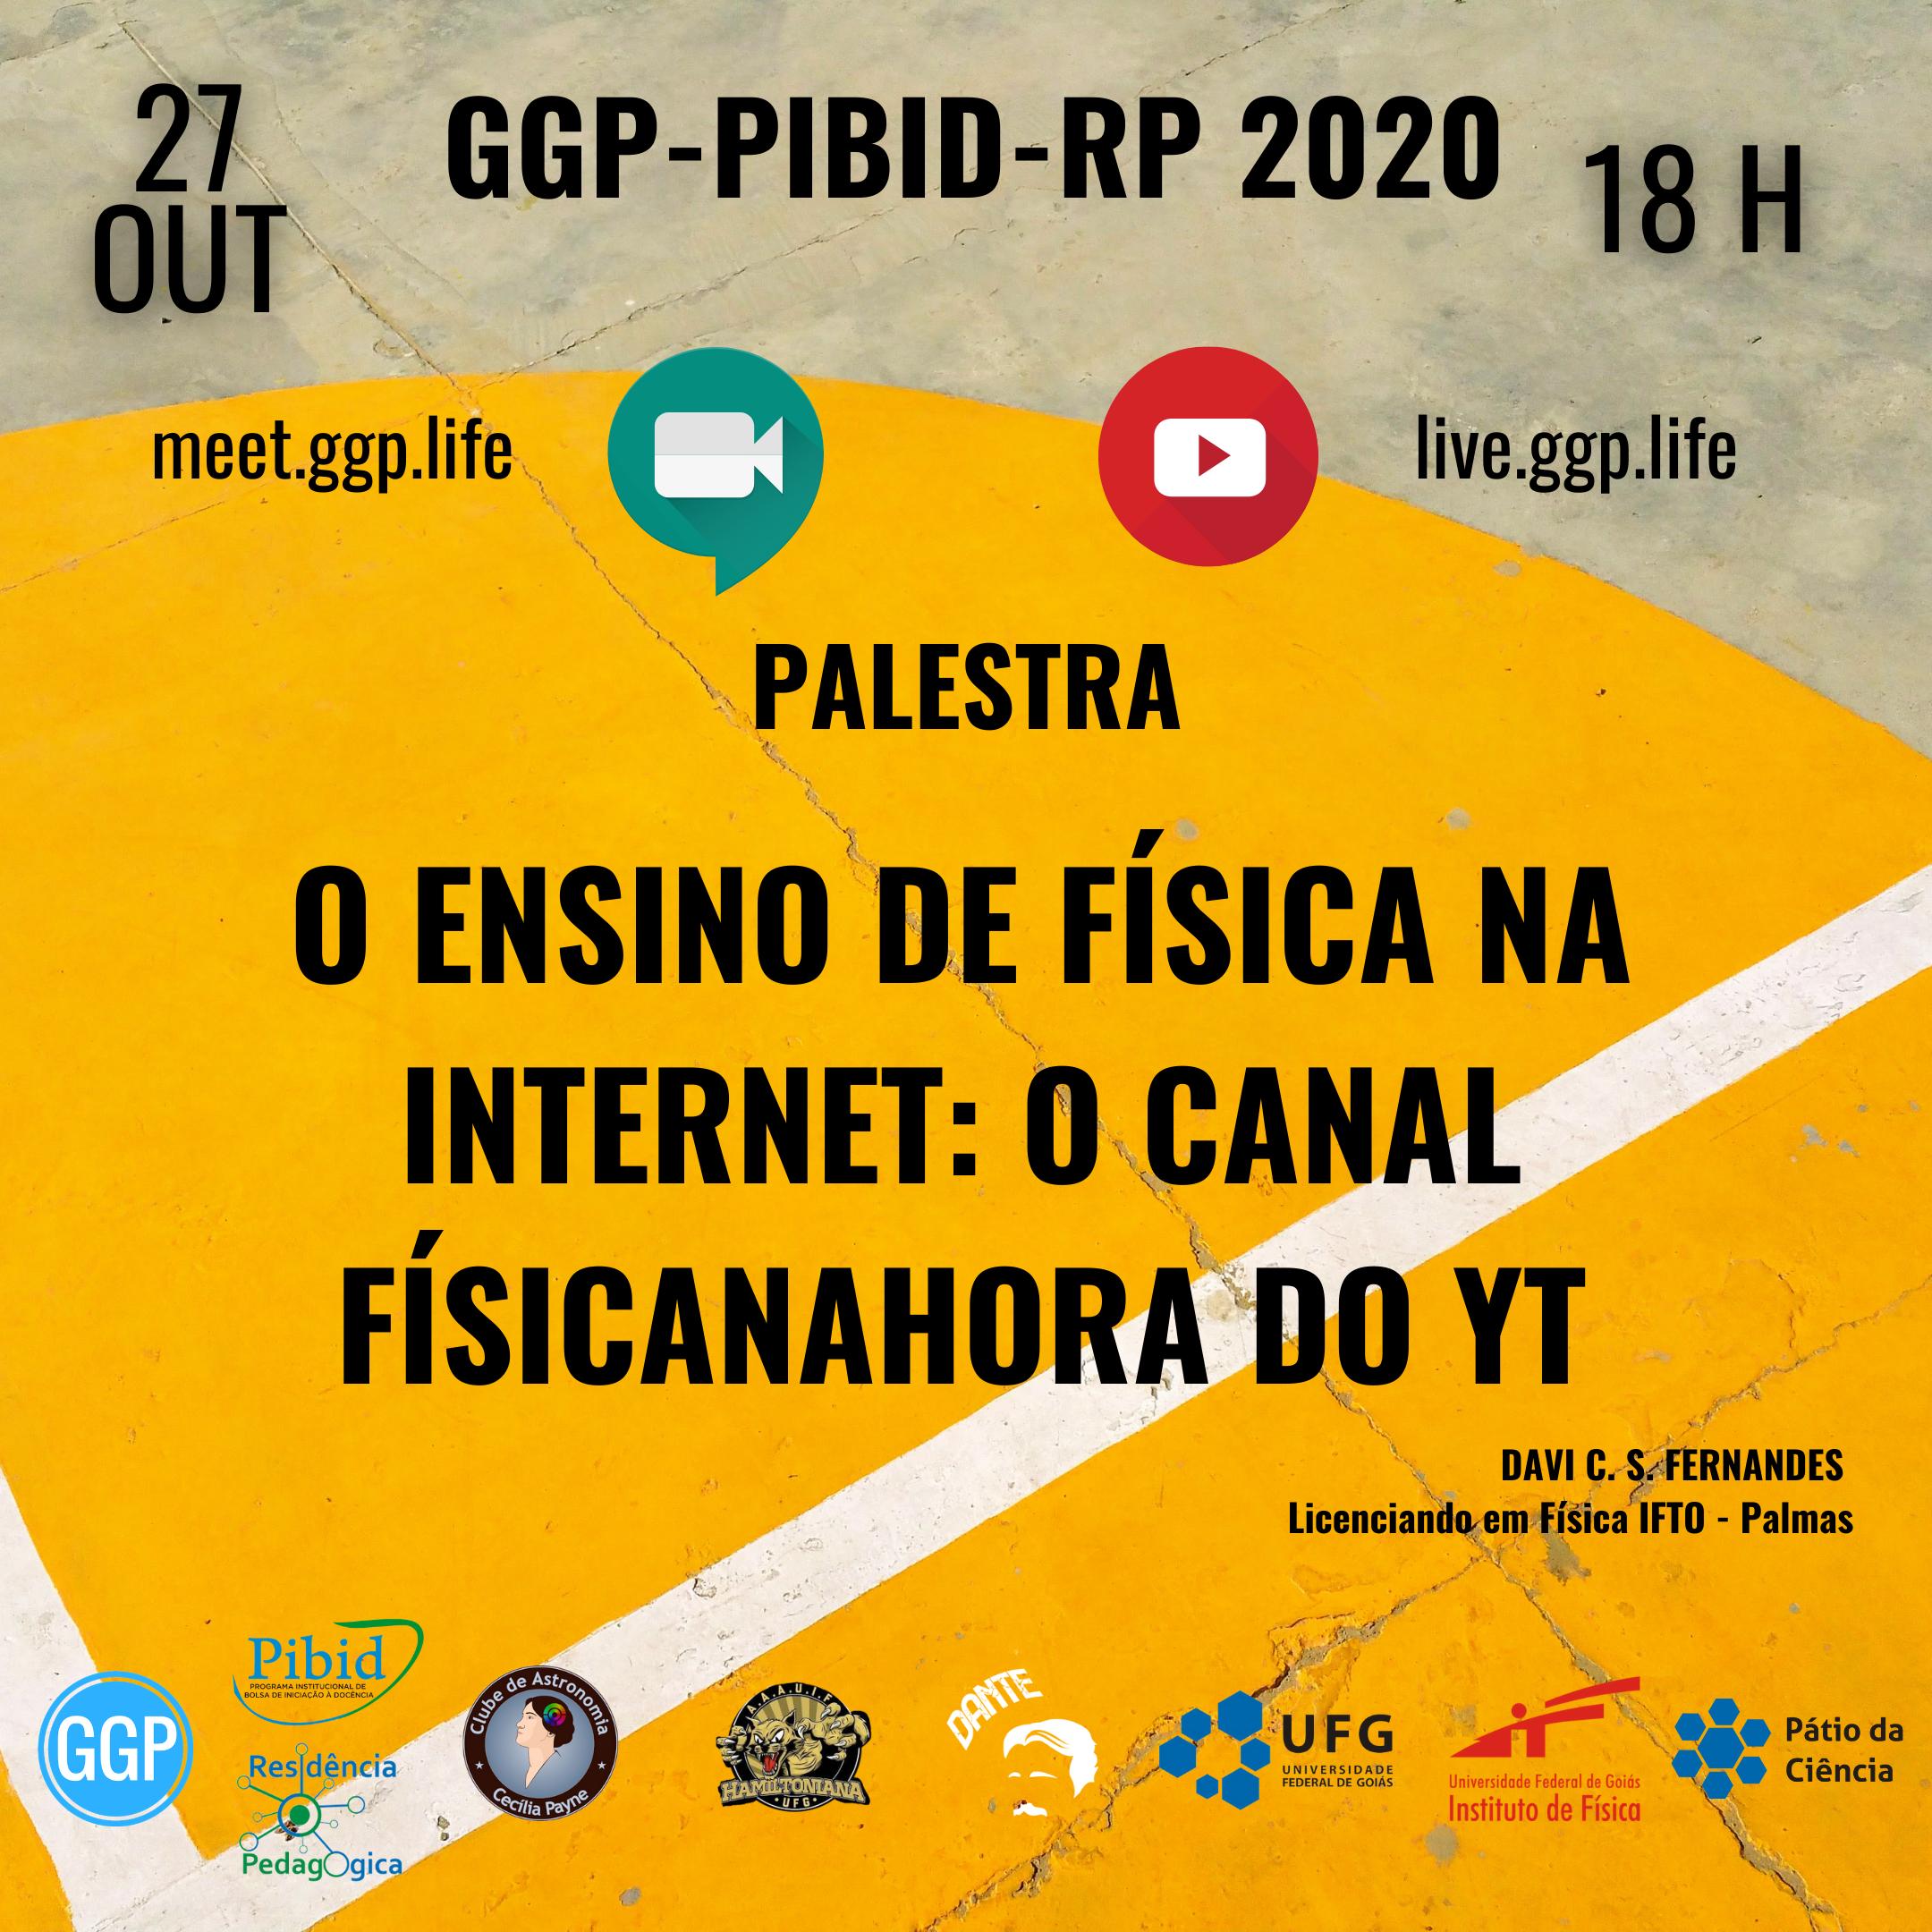 FEED FOLDER Palestra GGP_PIBID_RP ENSINO DE FÍSICA NA INTERNET 27 OUT 2020